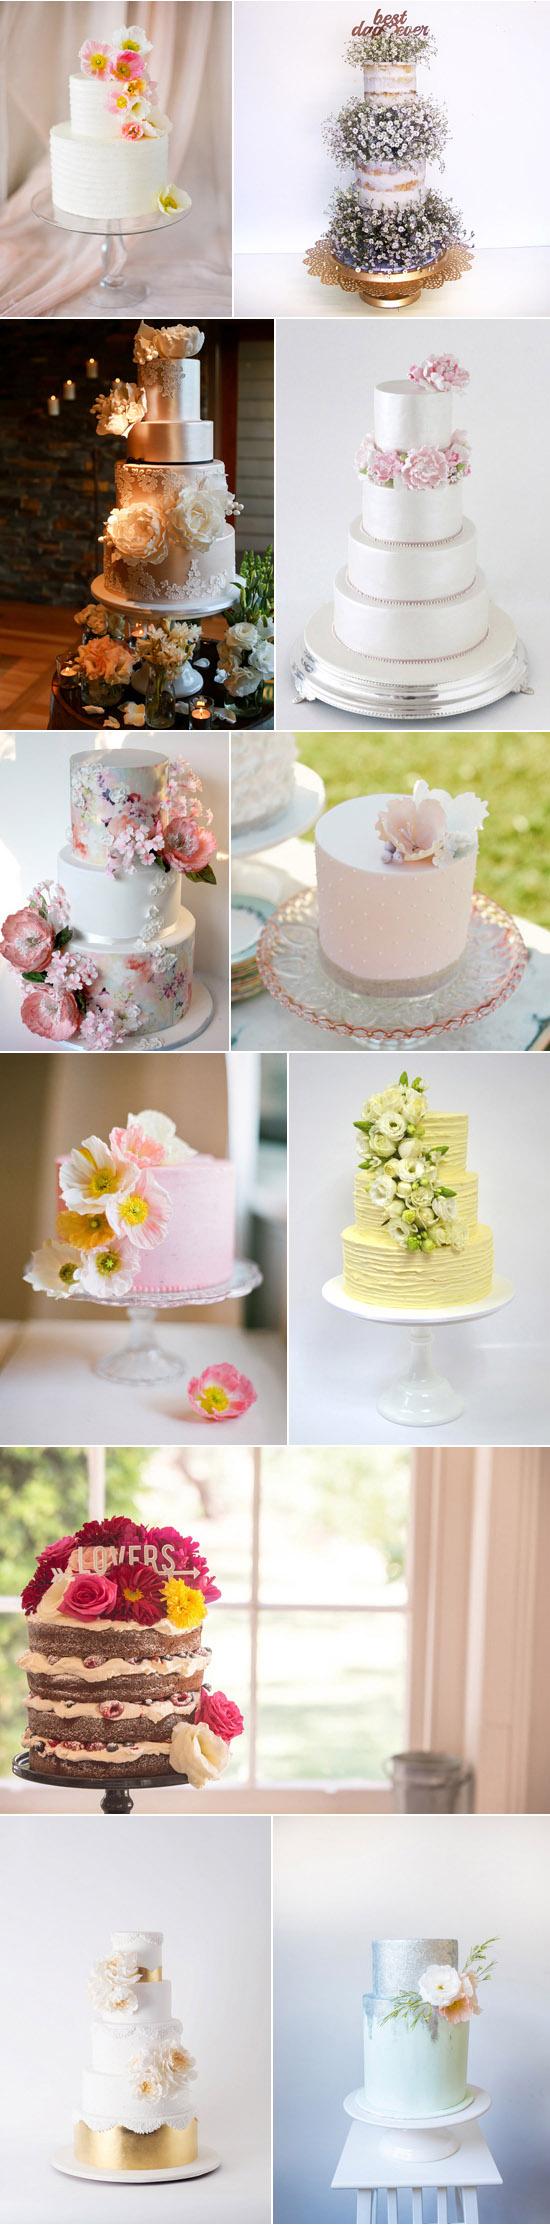 Spring Cakes For Weddings Spring Wedding Cakes